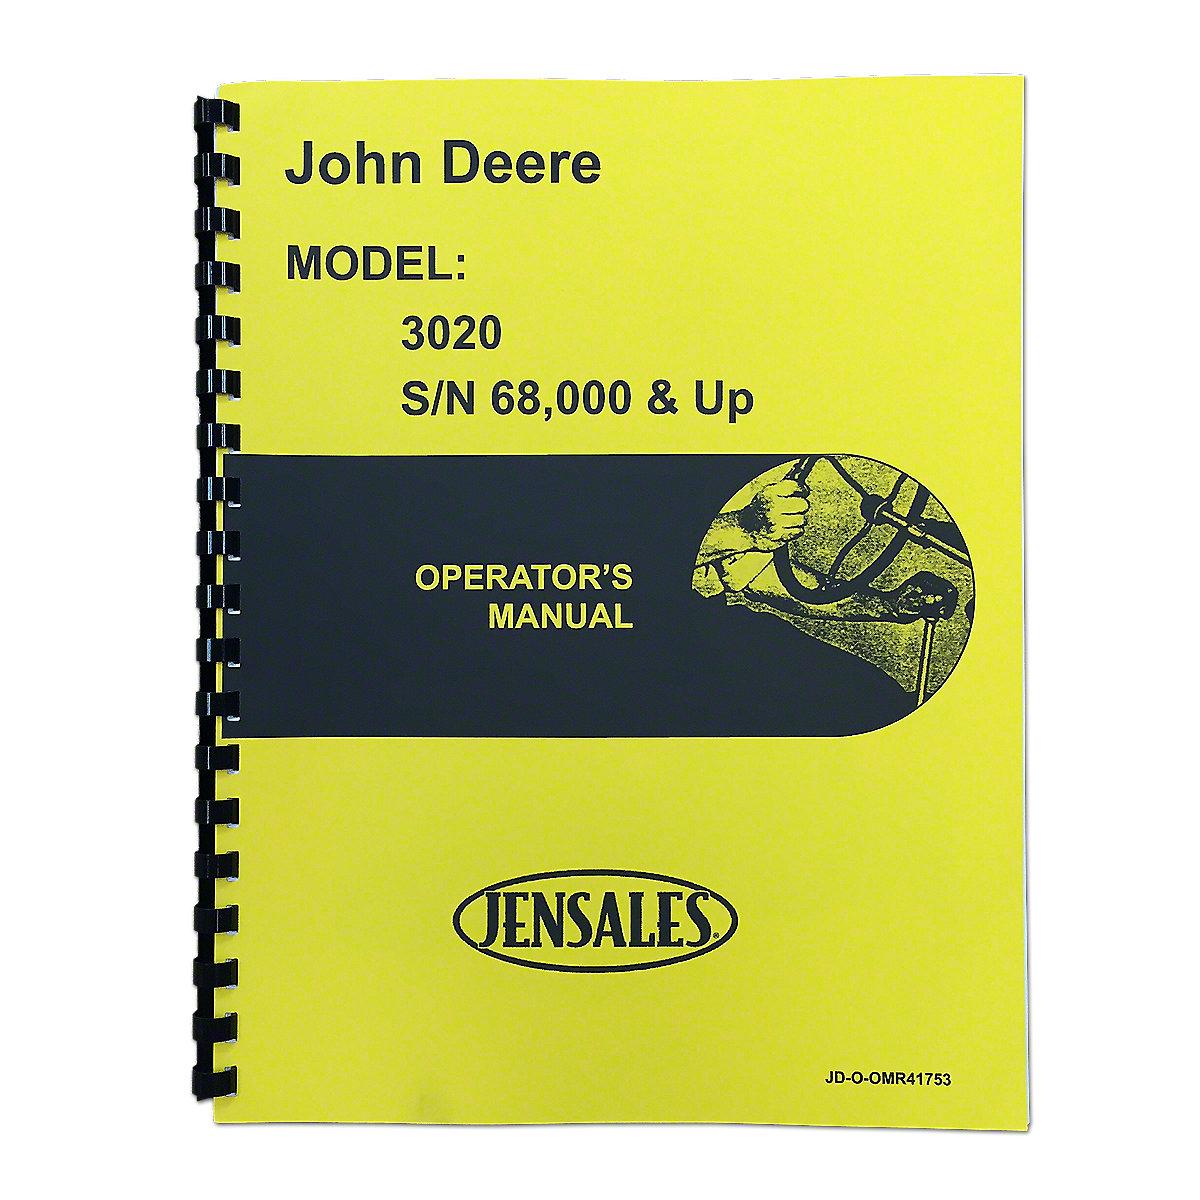 Restoration Quality Wiring Harness Jds3594 John Deere 3020 Operators Manual Reprint Jd Gas Diesel Serial Number 68000 And Higher